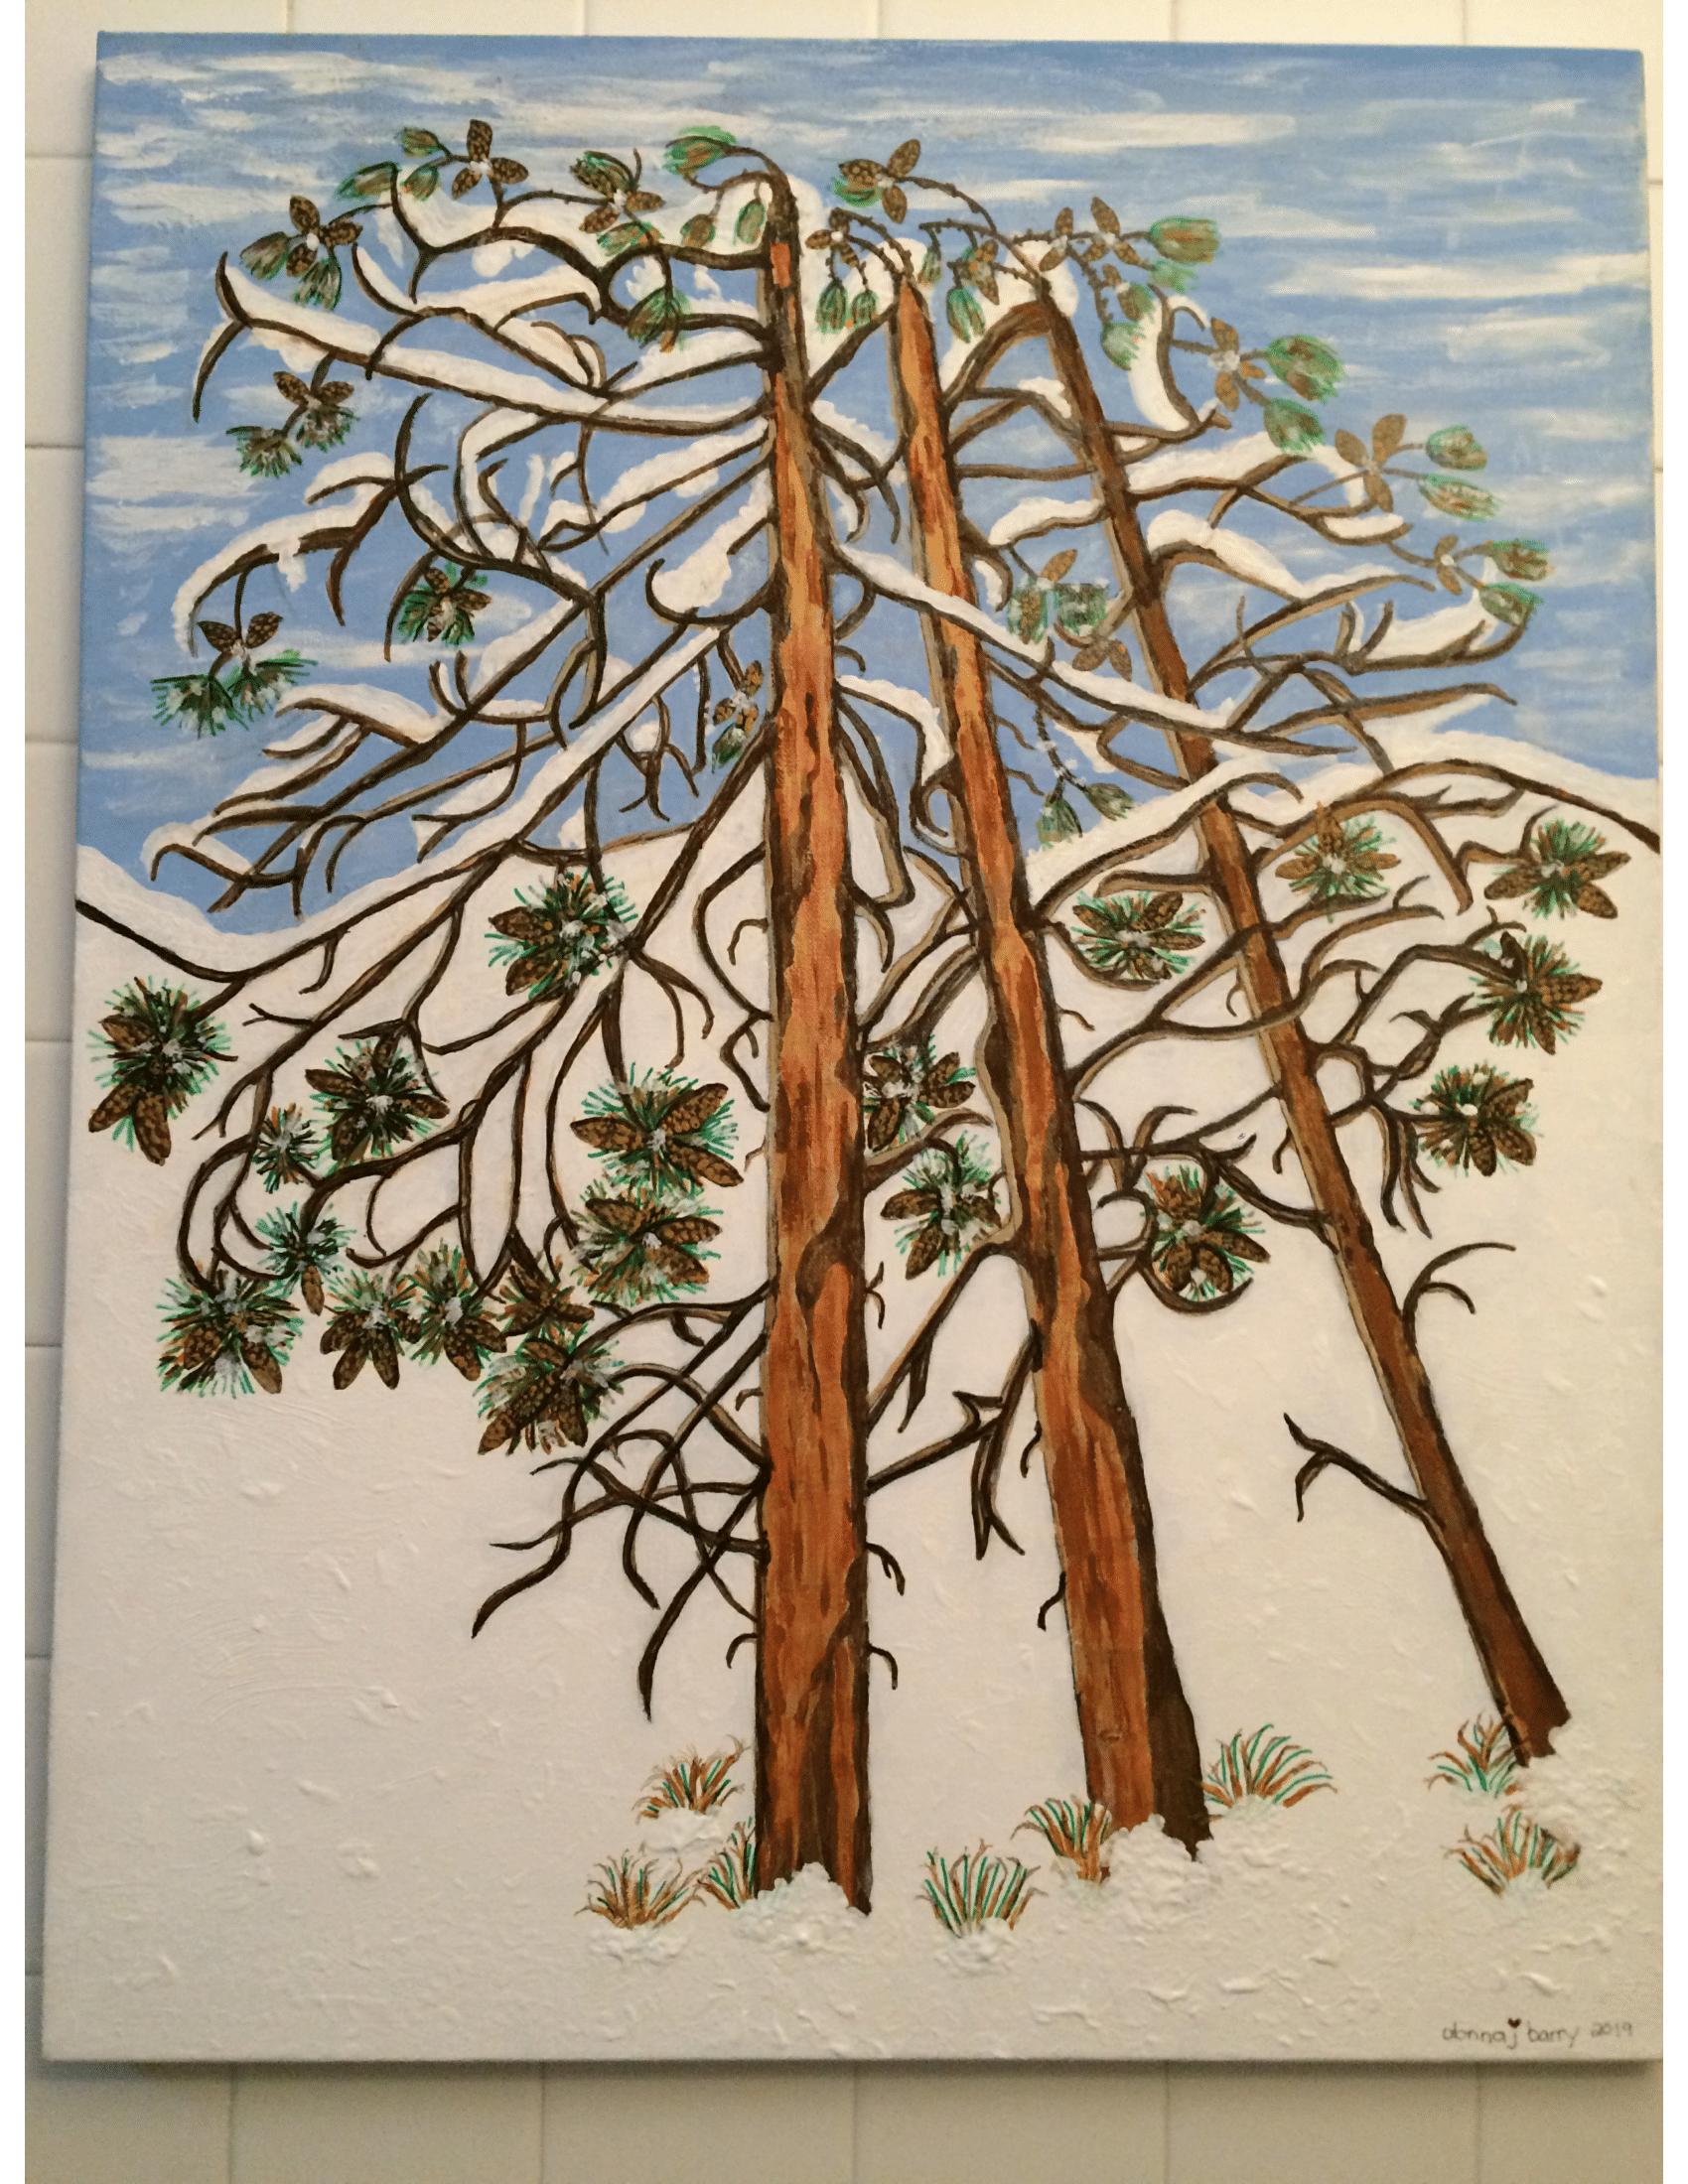 'Snowfall on Ponderosa Pines in Colorado'